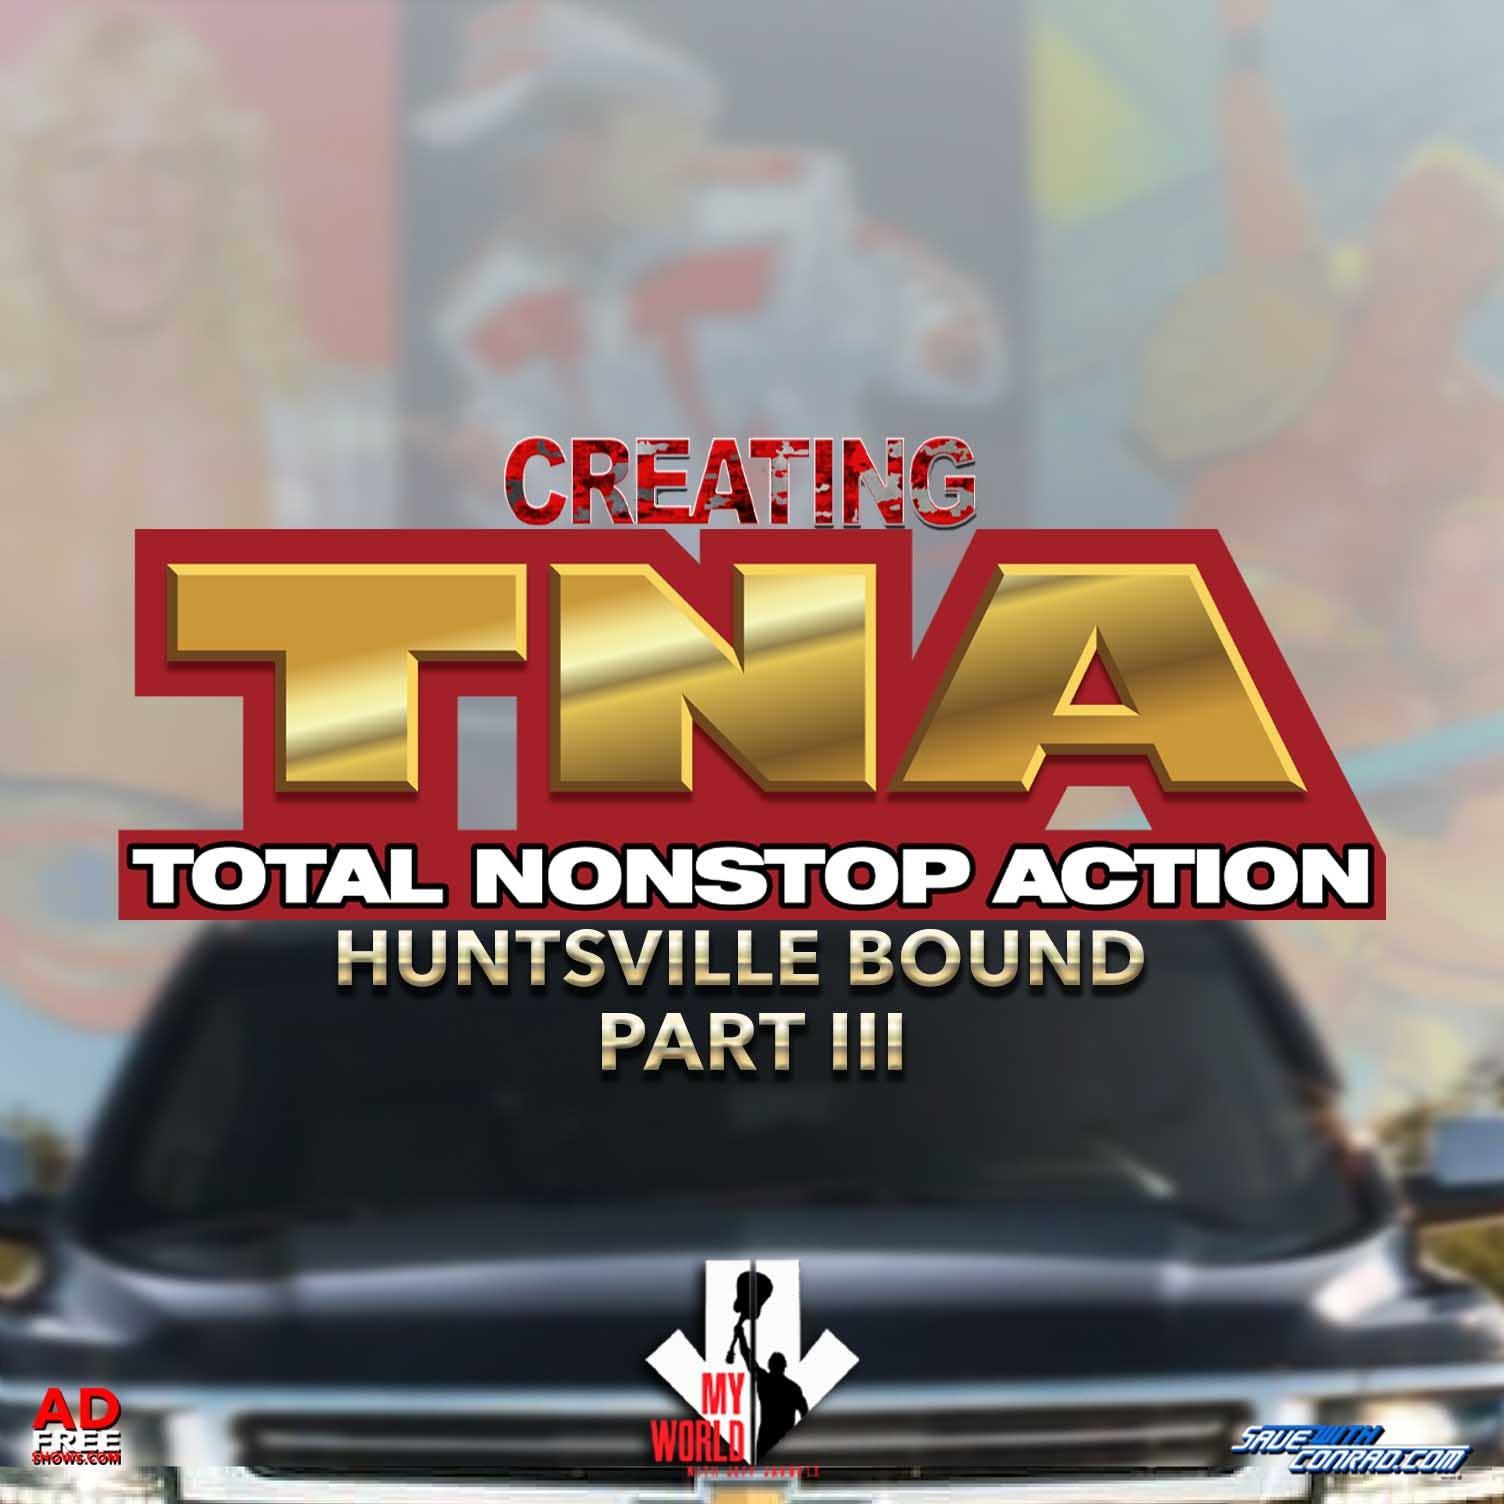 Episode 7: Creating TNA Pt 3 - Huntsville Bound